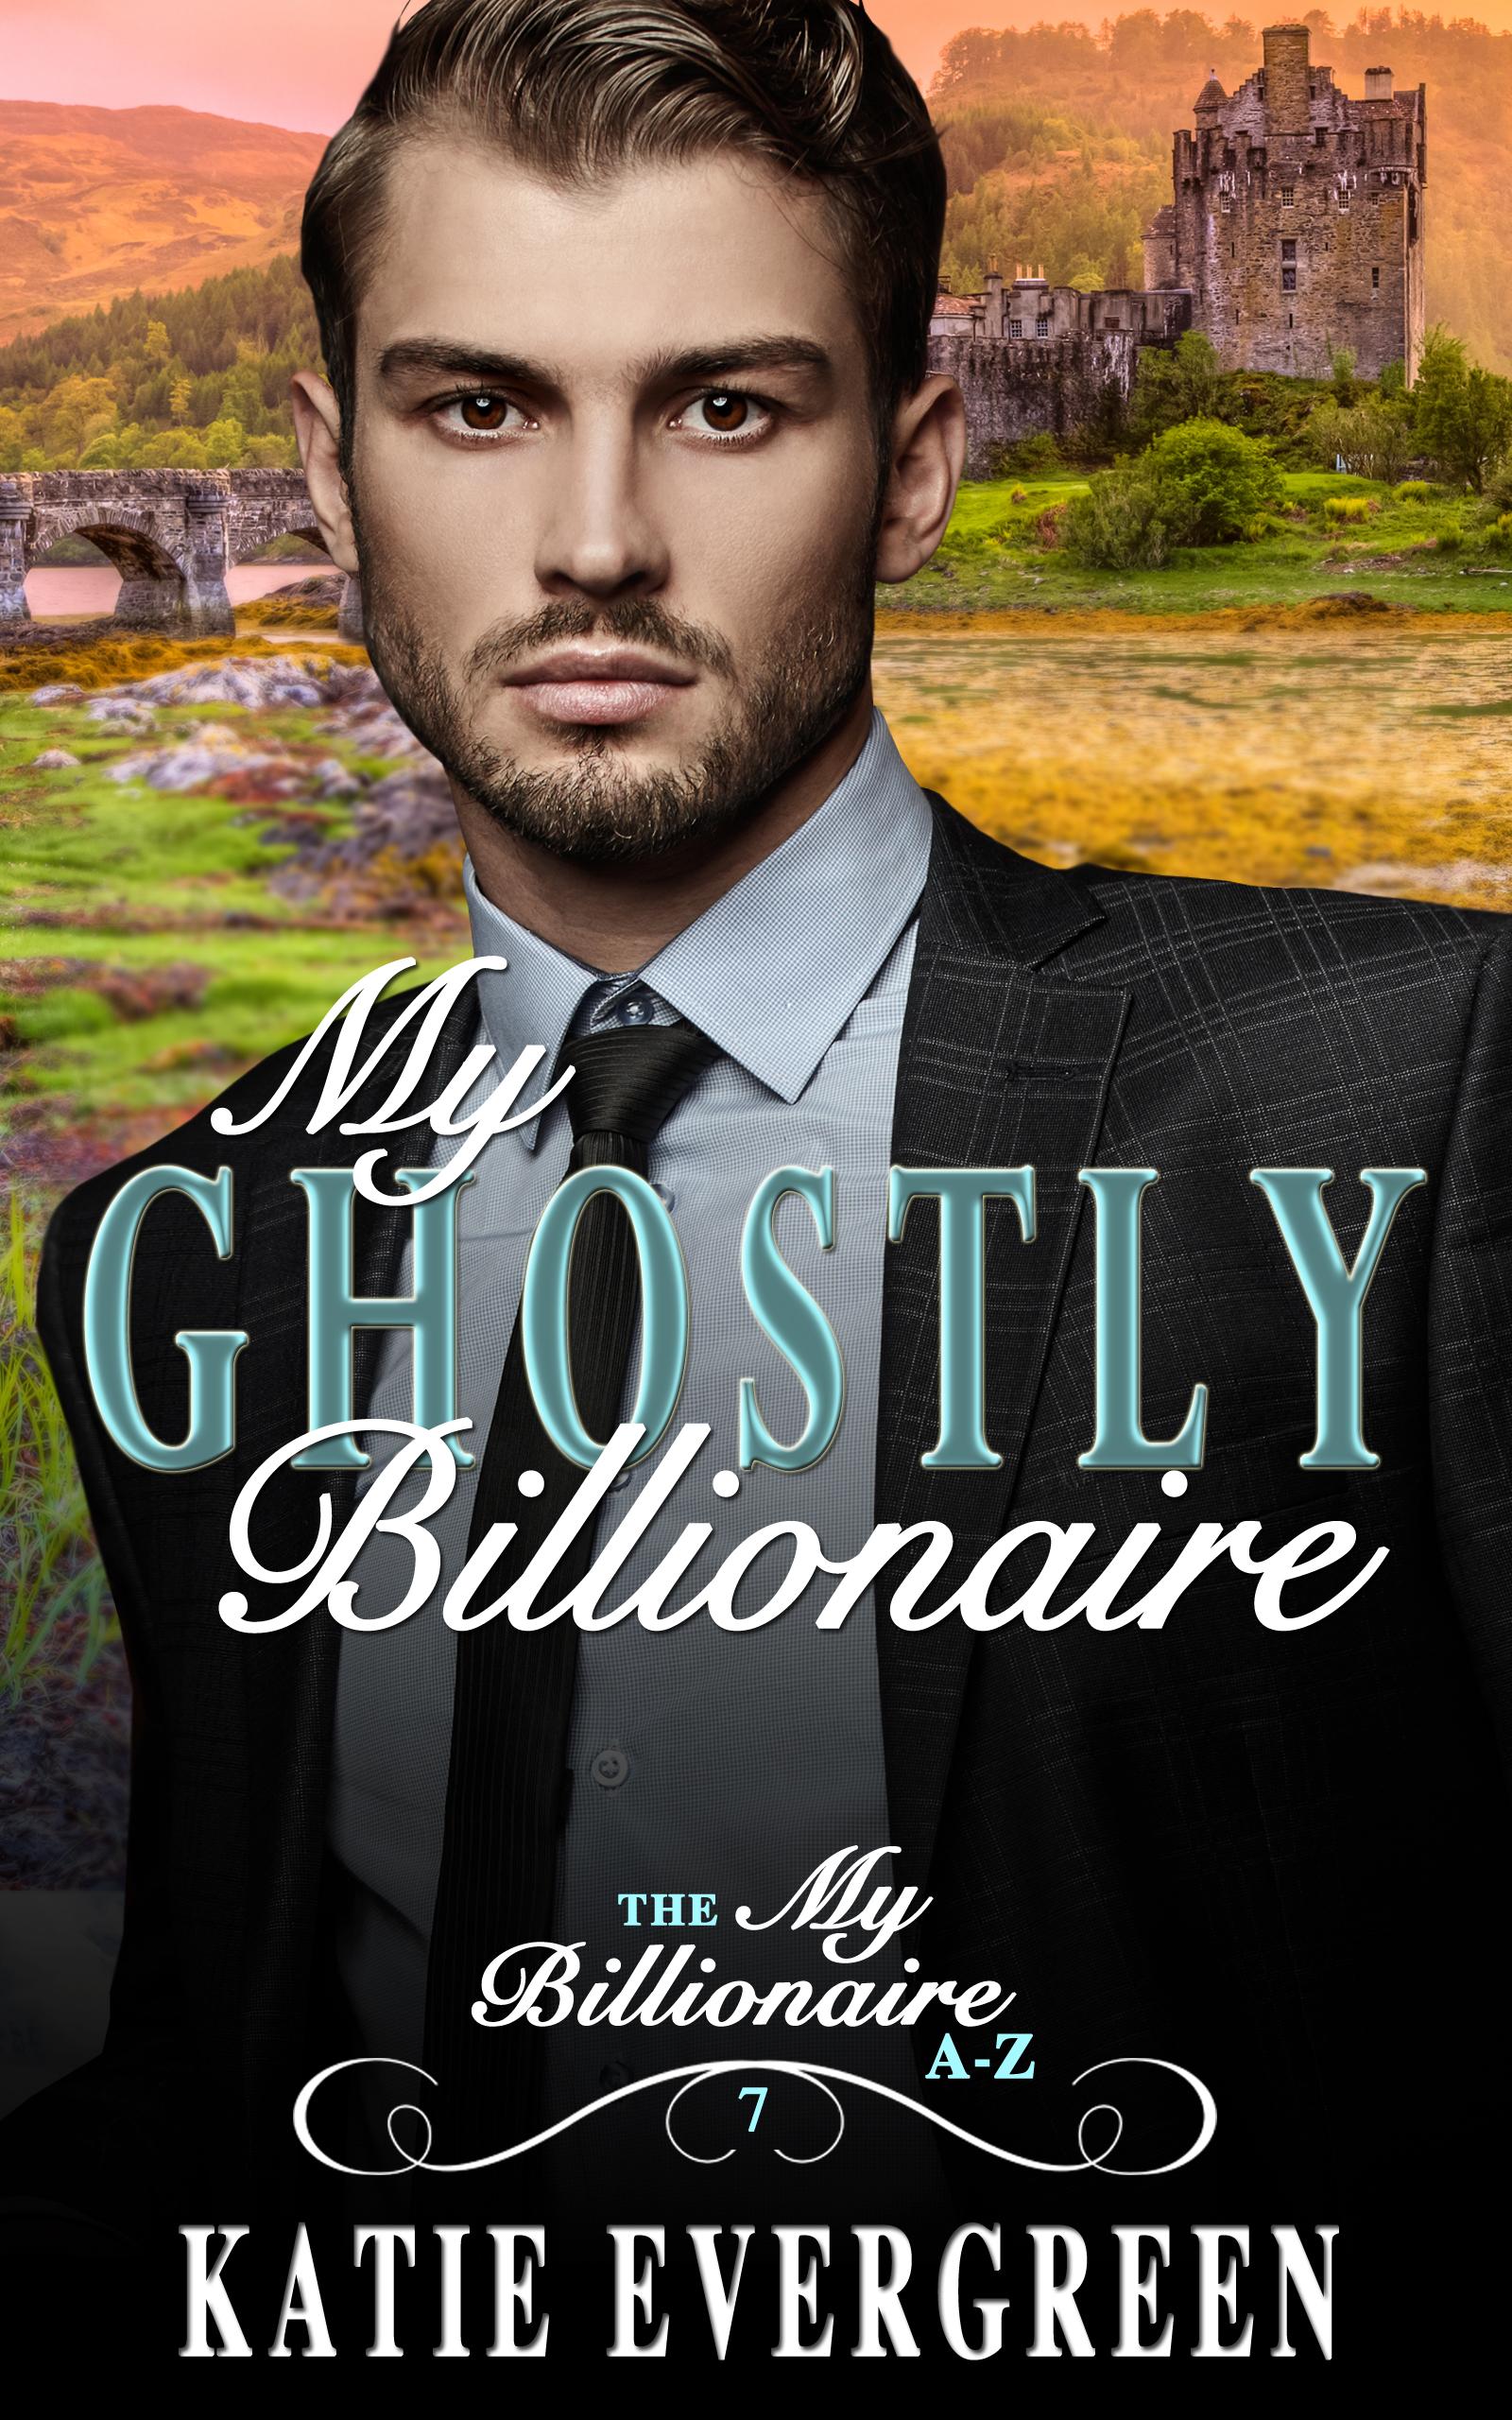 My Ghostly Billionaire